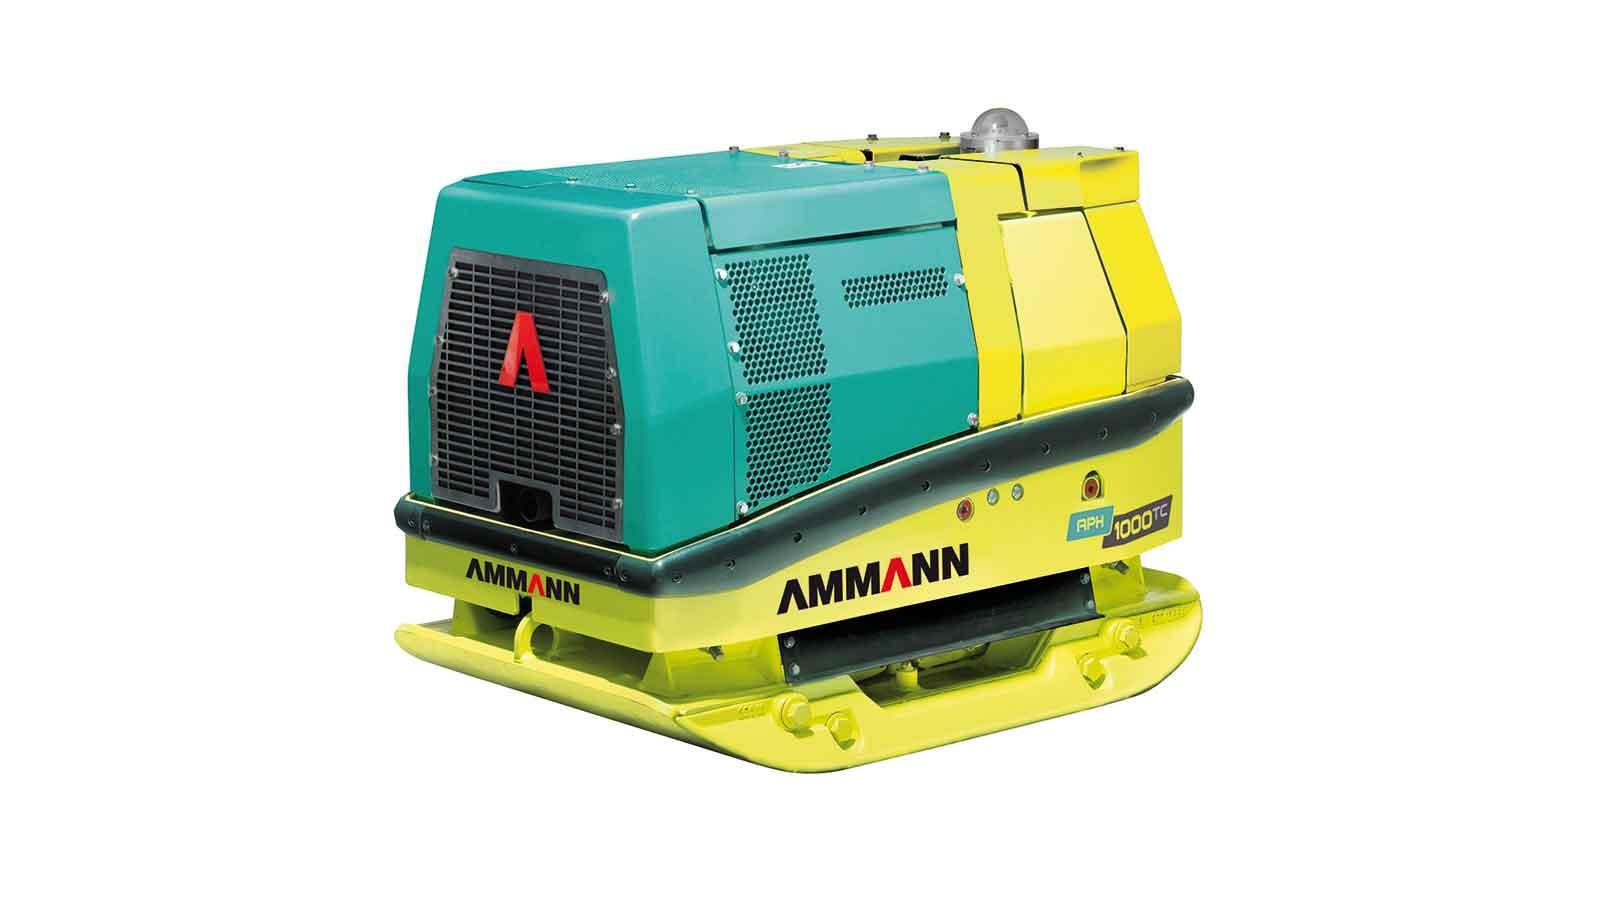 Placa compactoare reversibila hidrostatica AMMANN APH 1000 TC